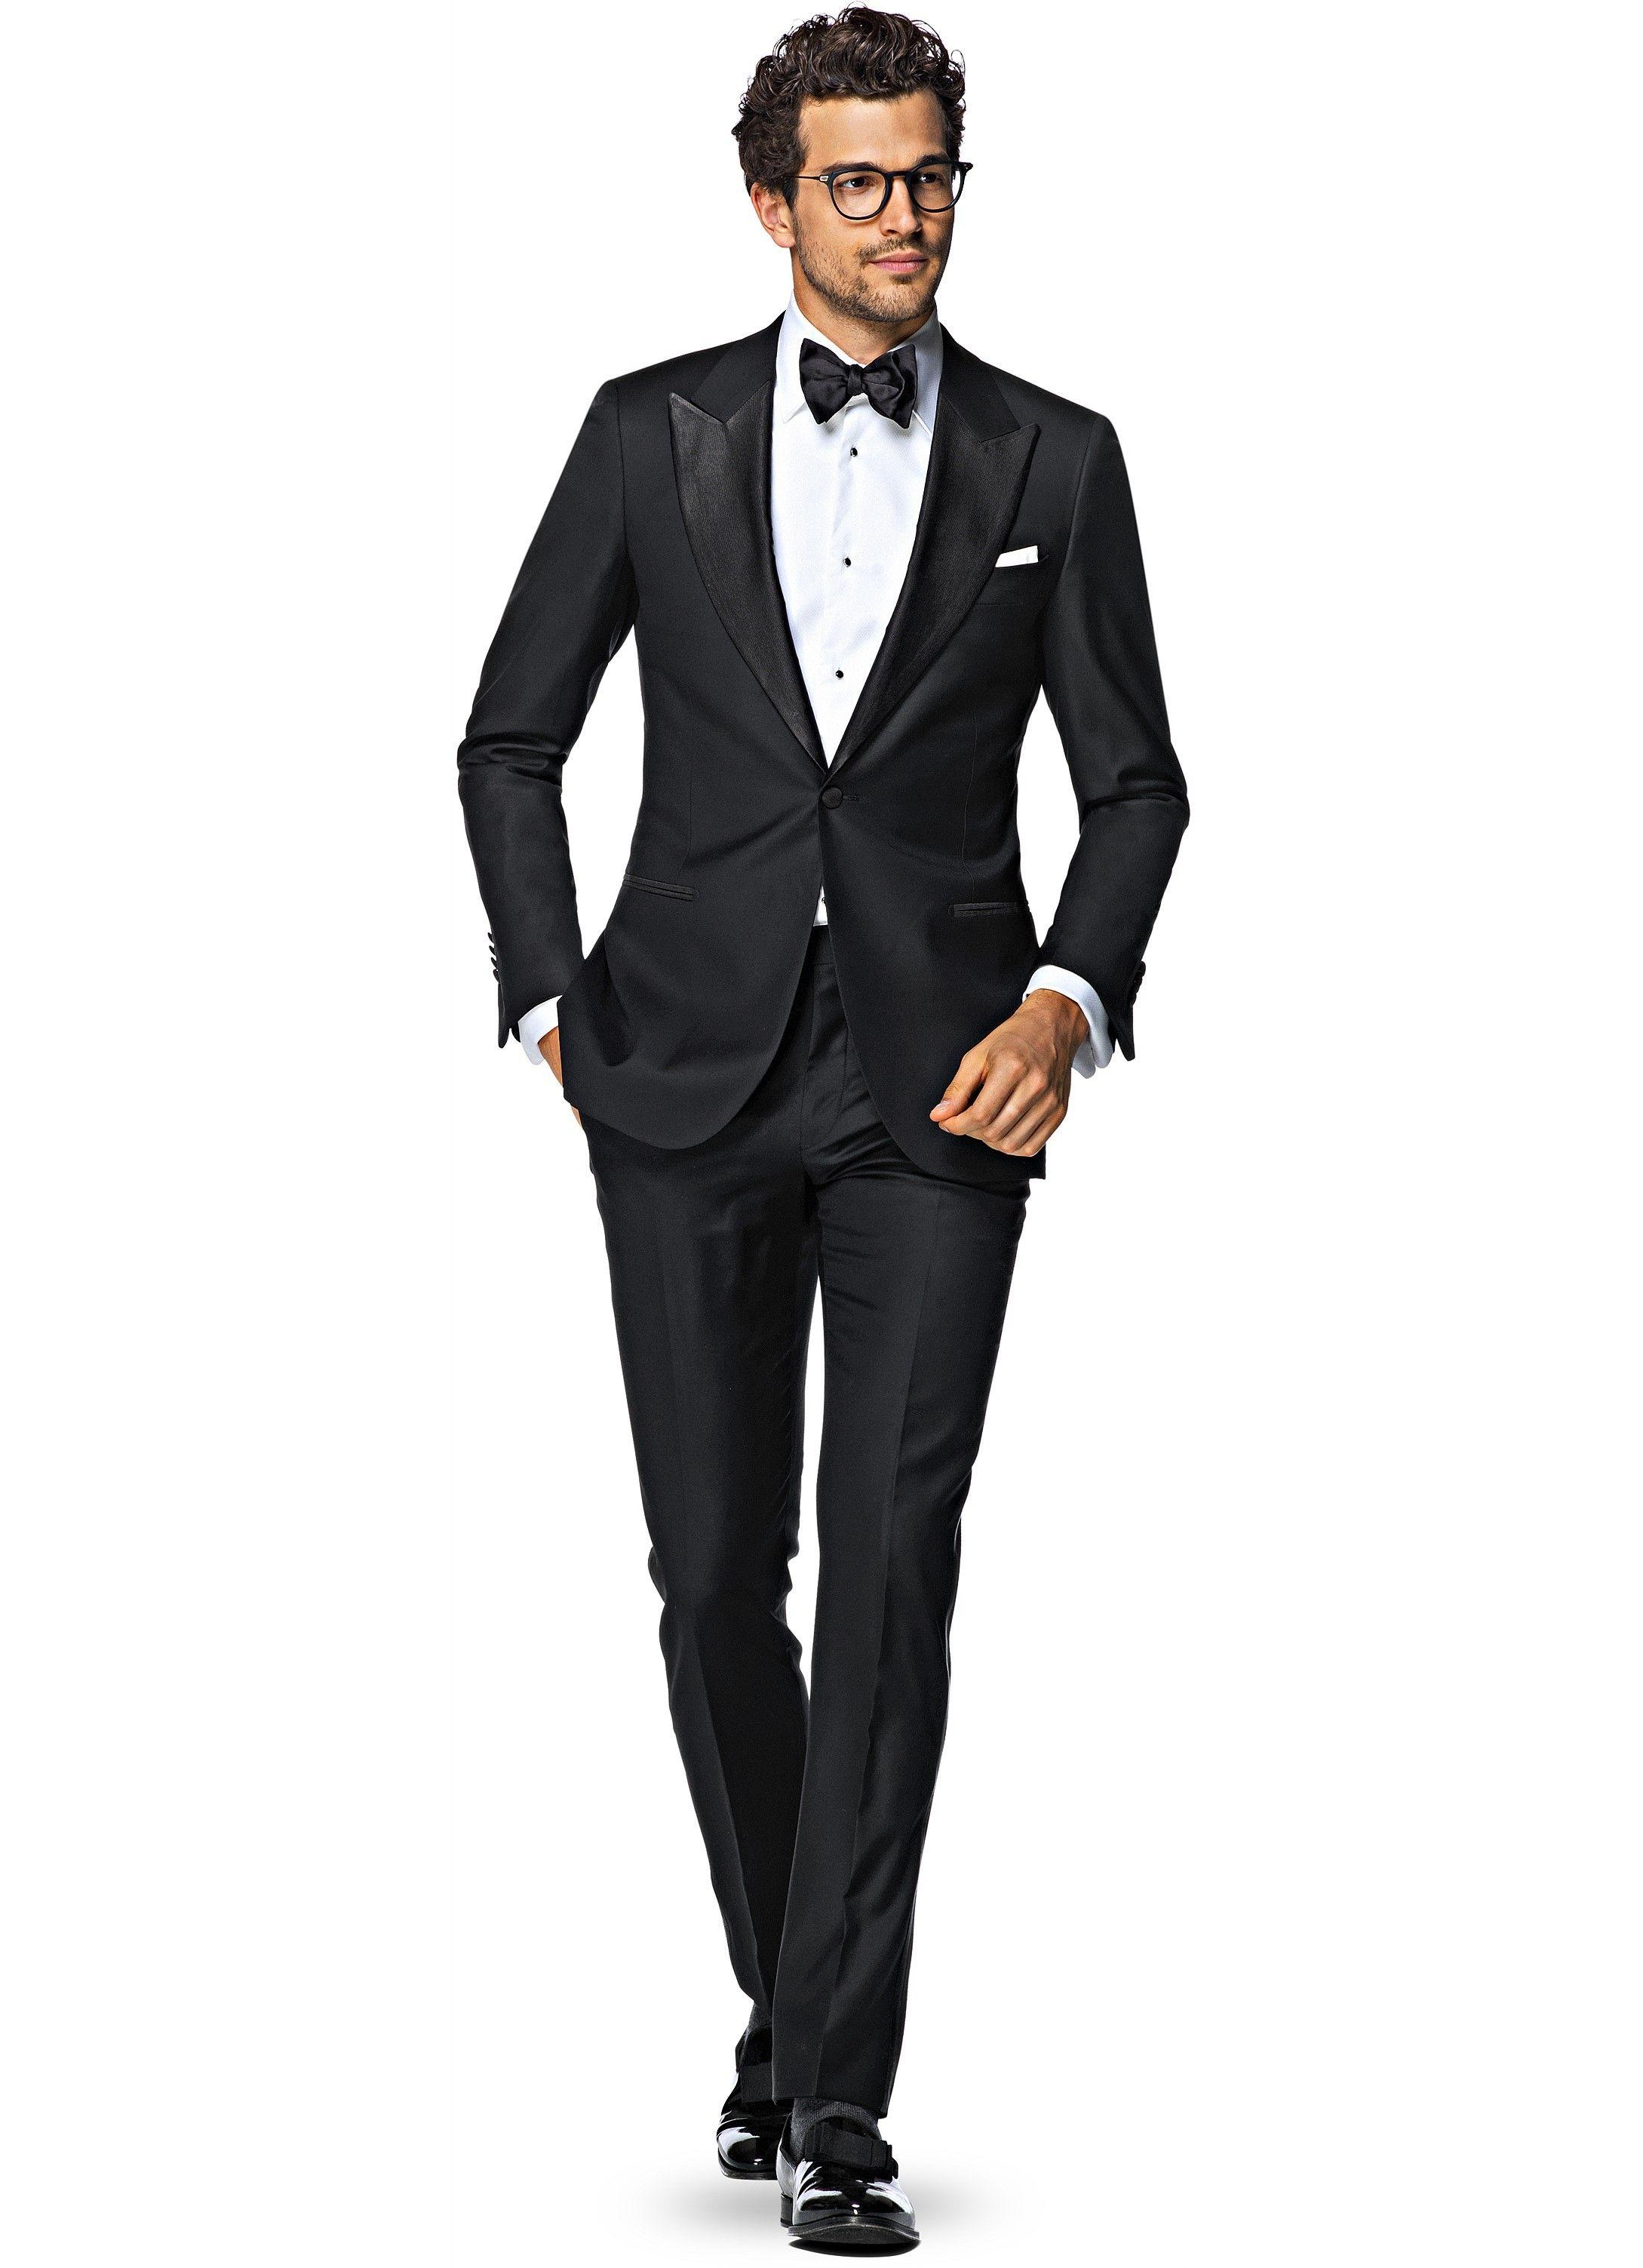 Imagini pentru men's usa blazer | CHESTI DE IMBRACAT 2 | Pinterest ...